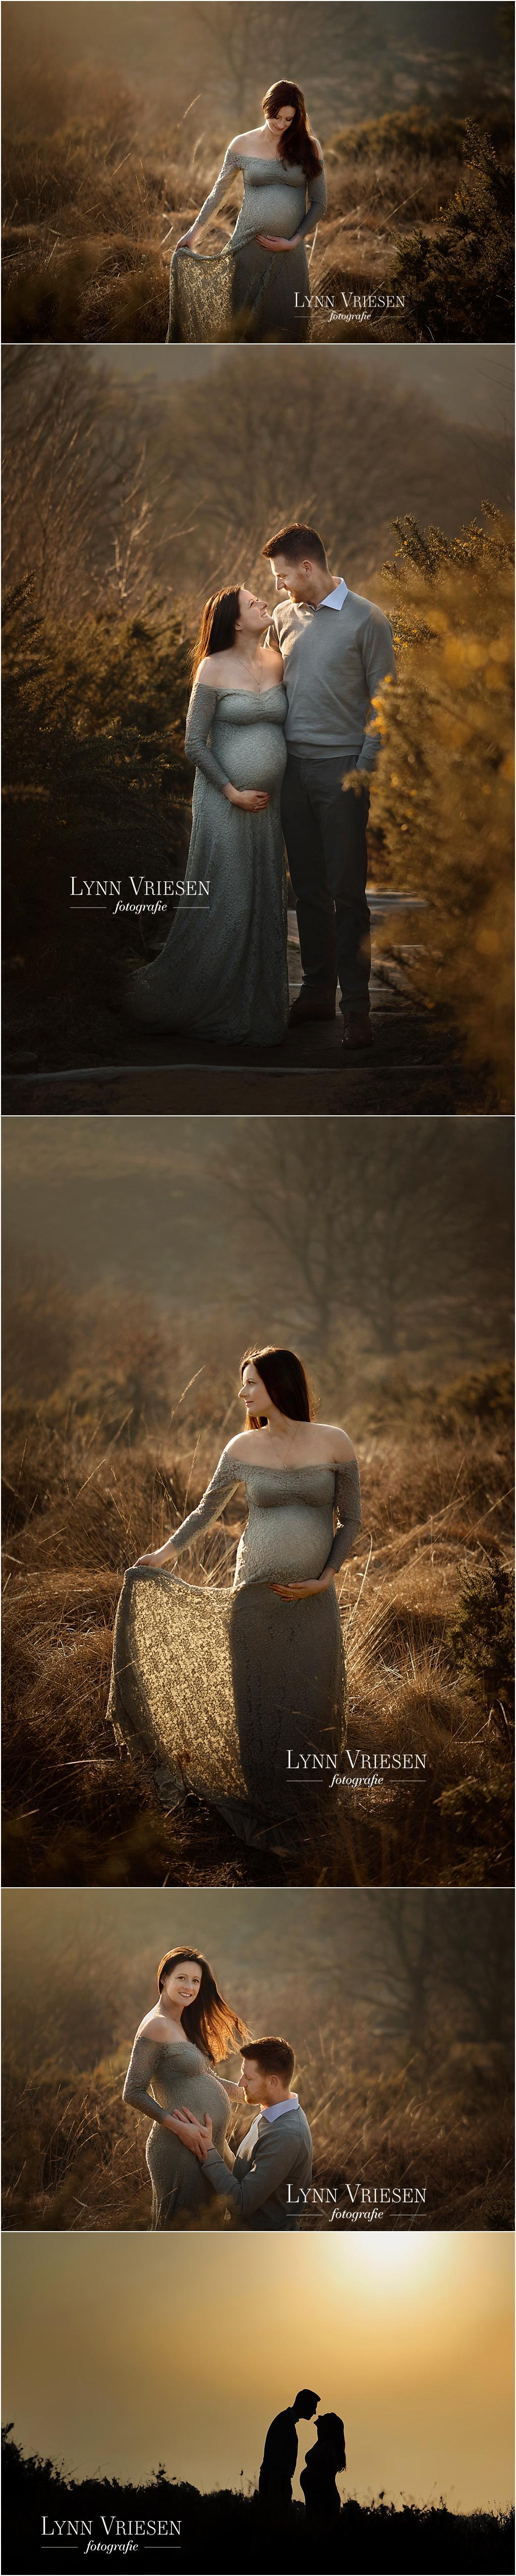 Pauline 34 weken - Zwanger fotoshoot Duiven